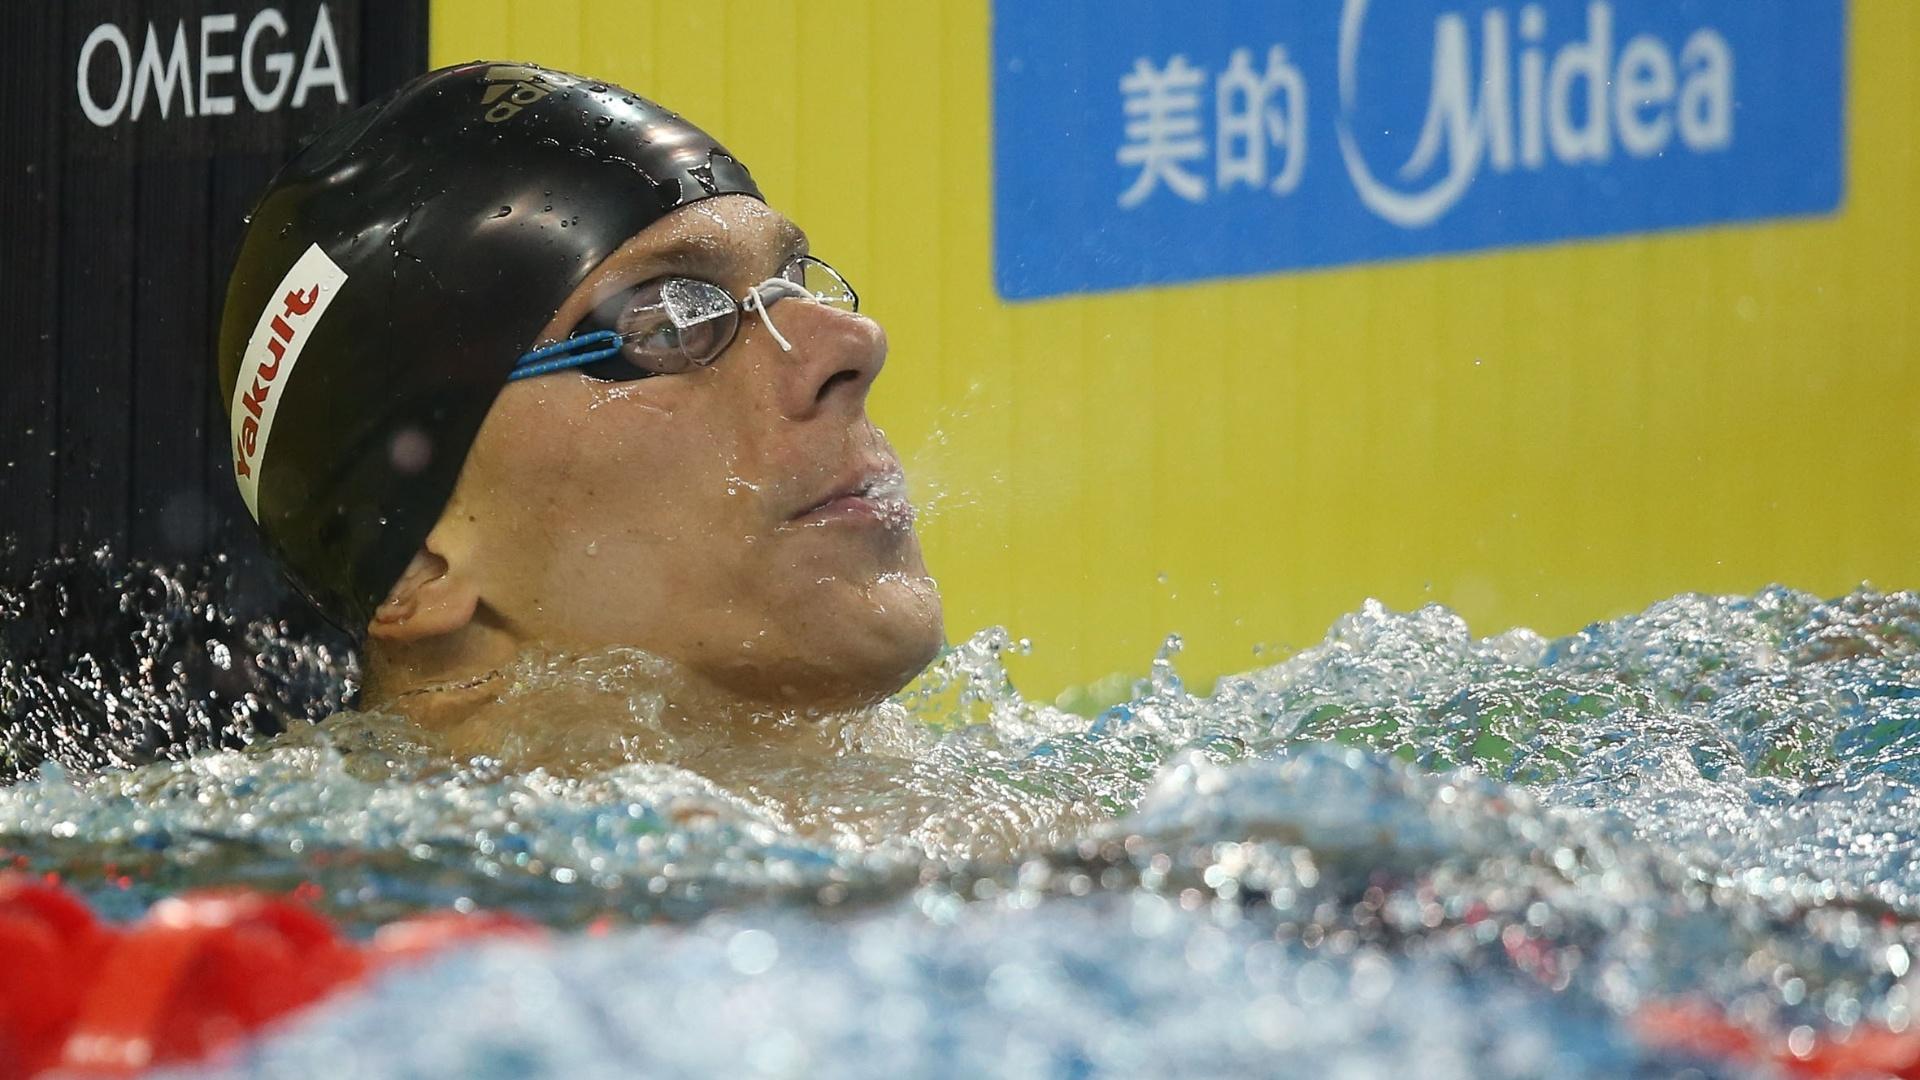 06. dez. 2014 - César Cielo após nadar a semifinal dos 100m livres em Doha